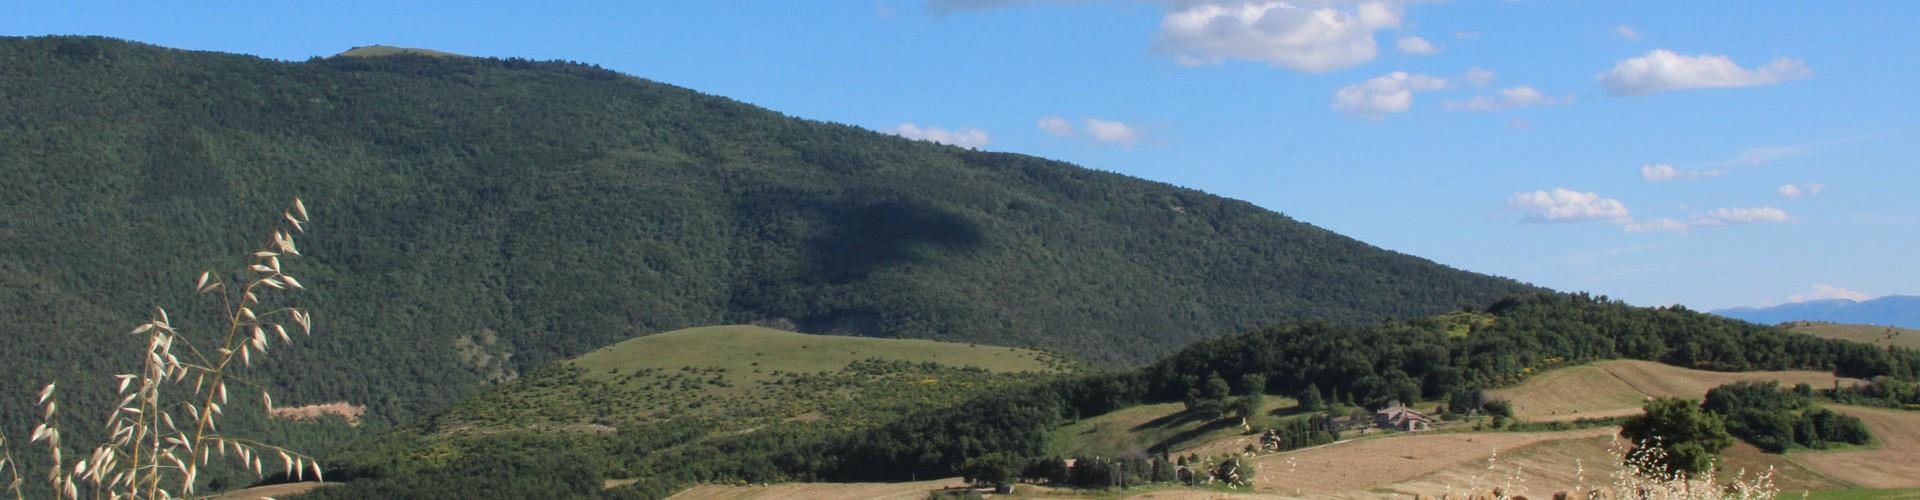 Relais Parco del Subasio | Agriturismo Assisi - Scopri il Parco Featured Image